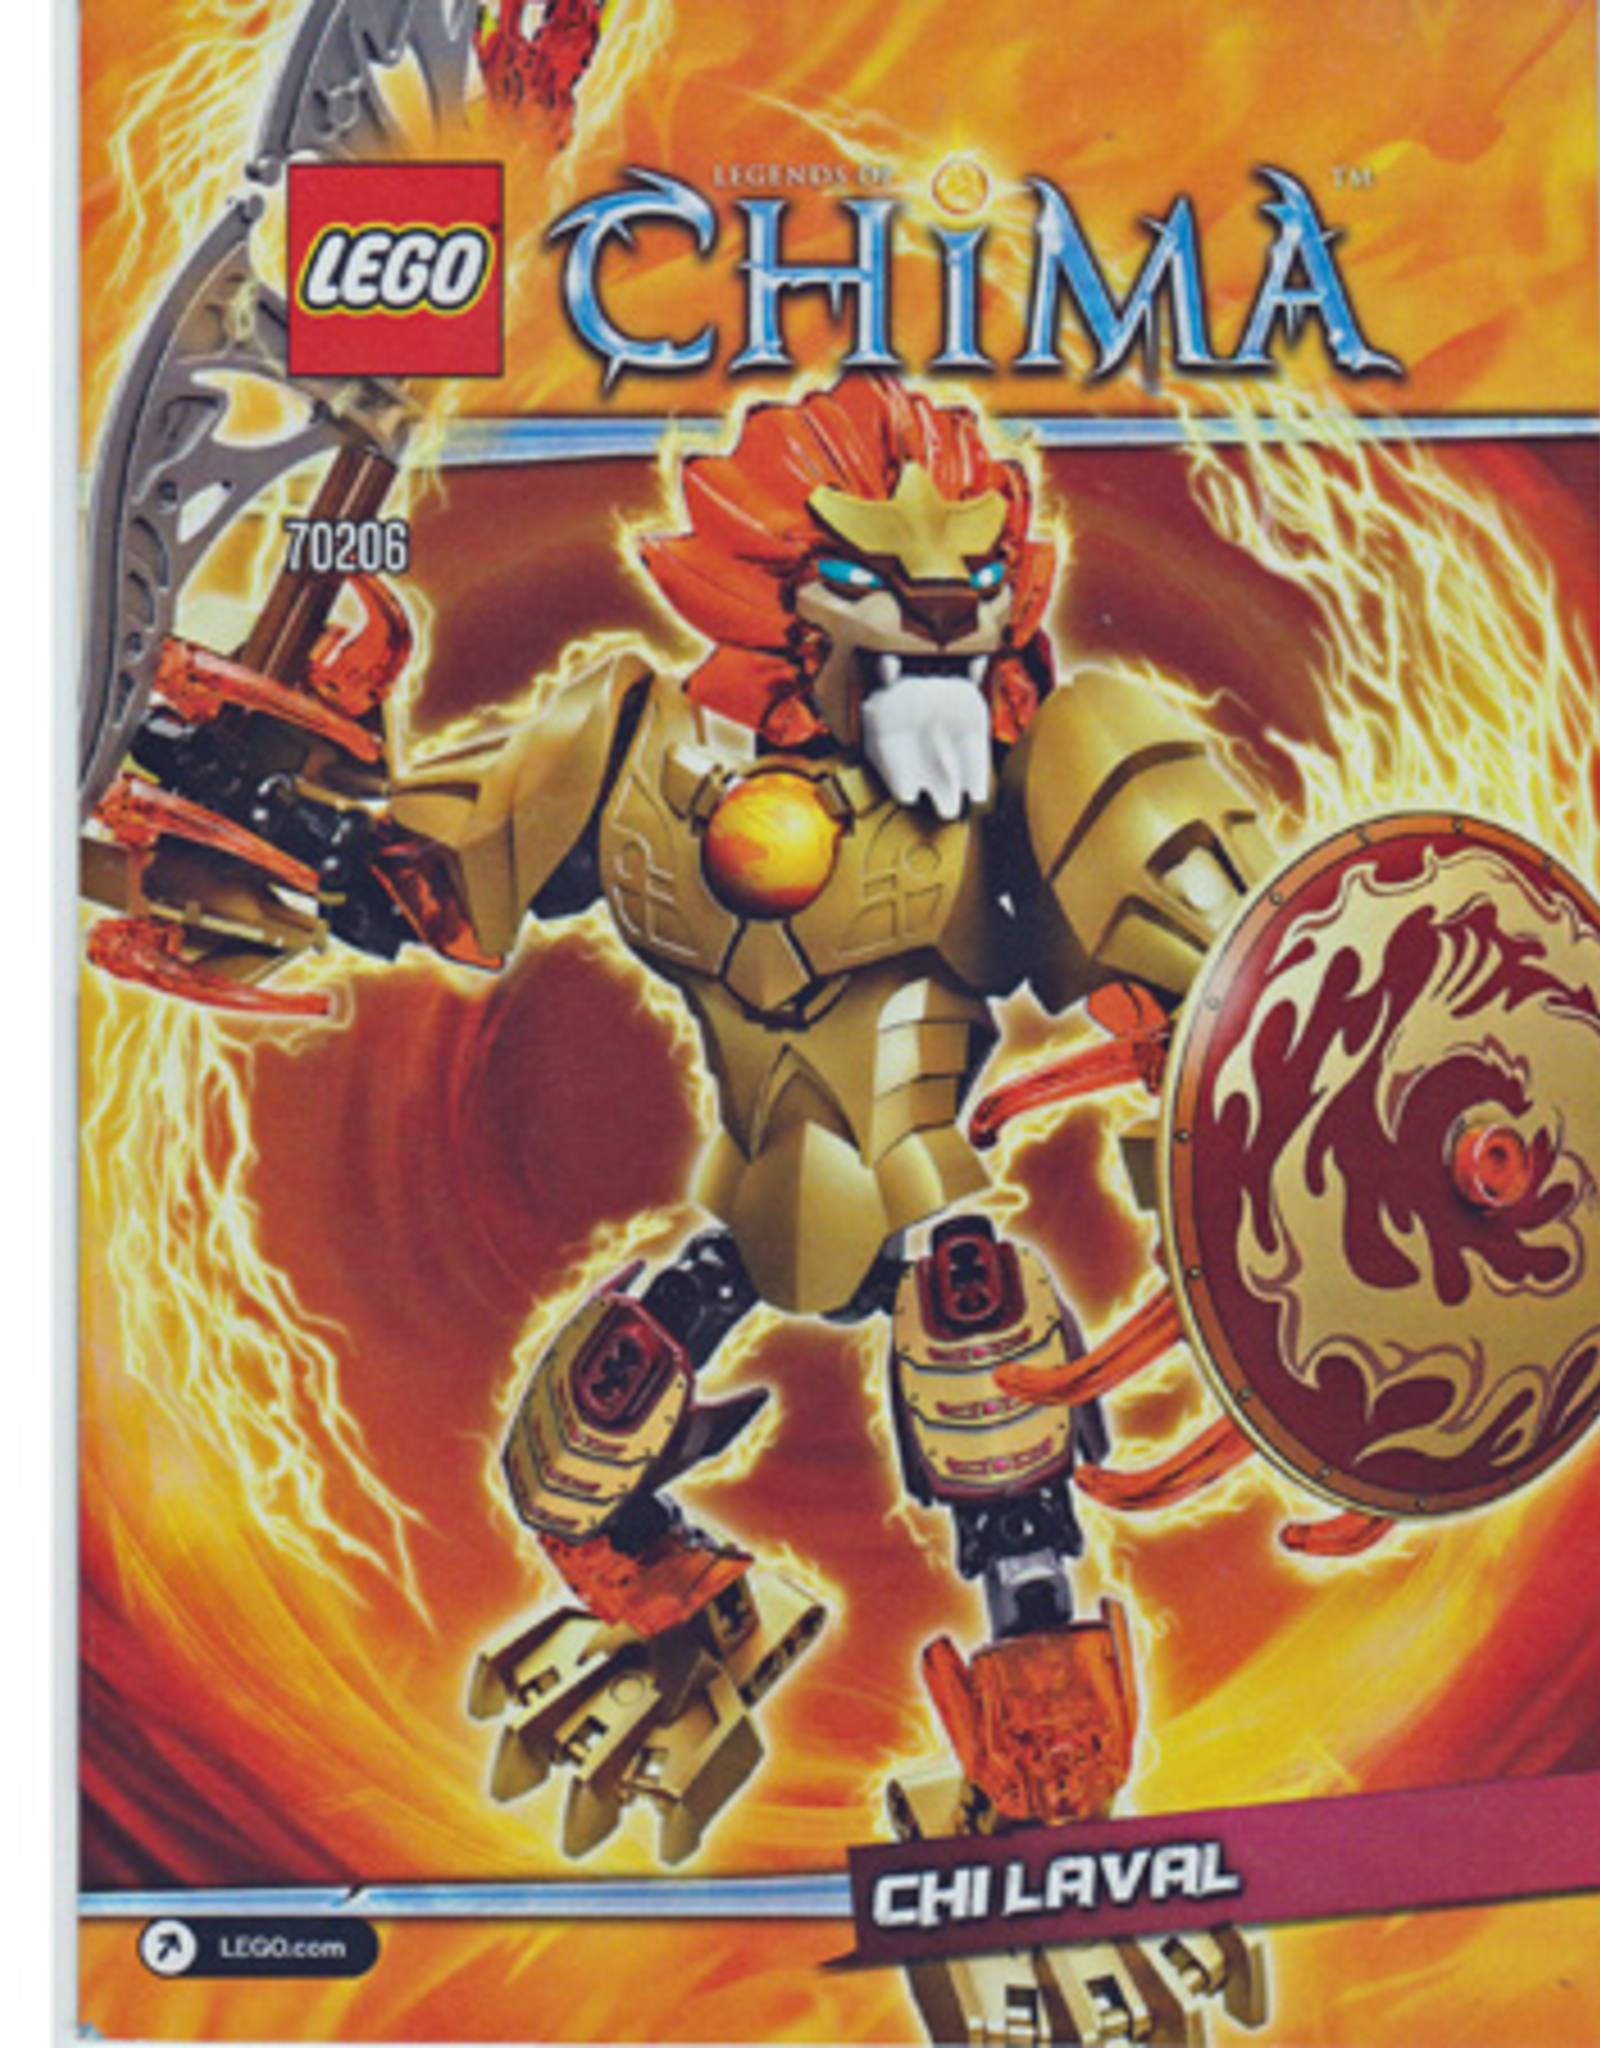 LEGO LEGO 70206 CHI Laval CHIMA